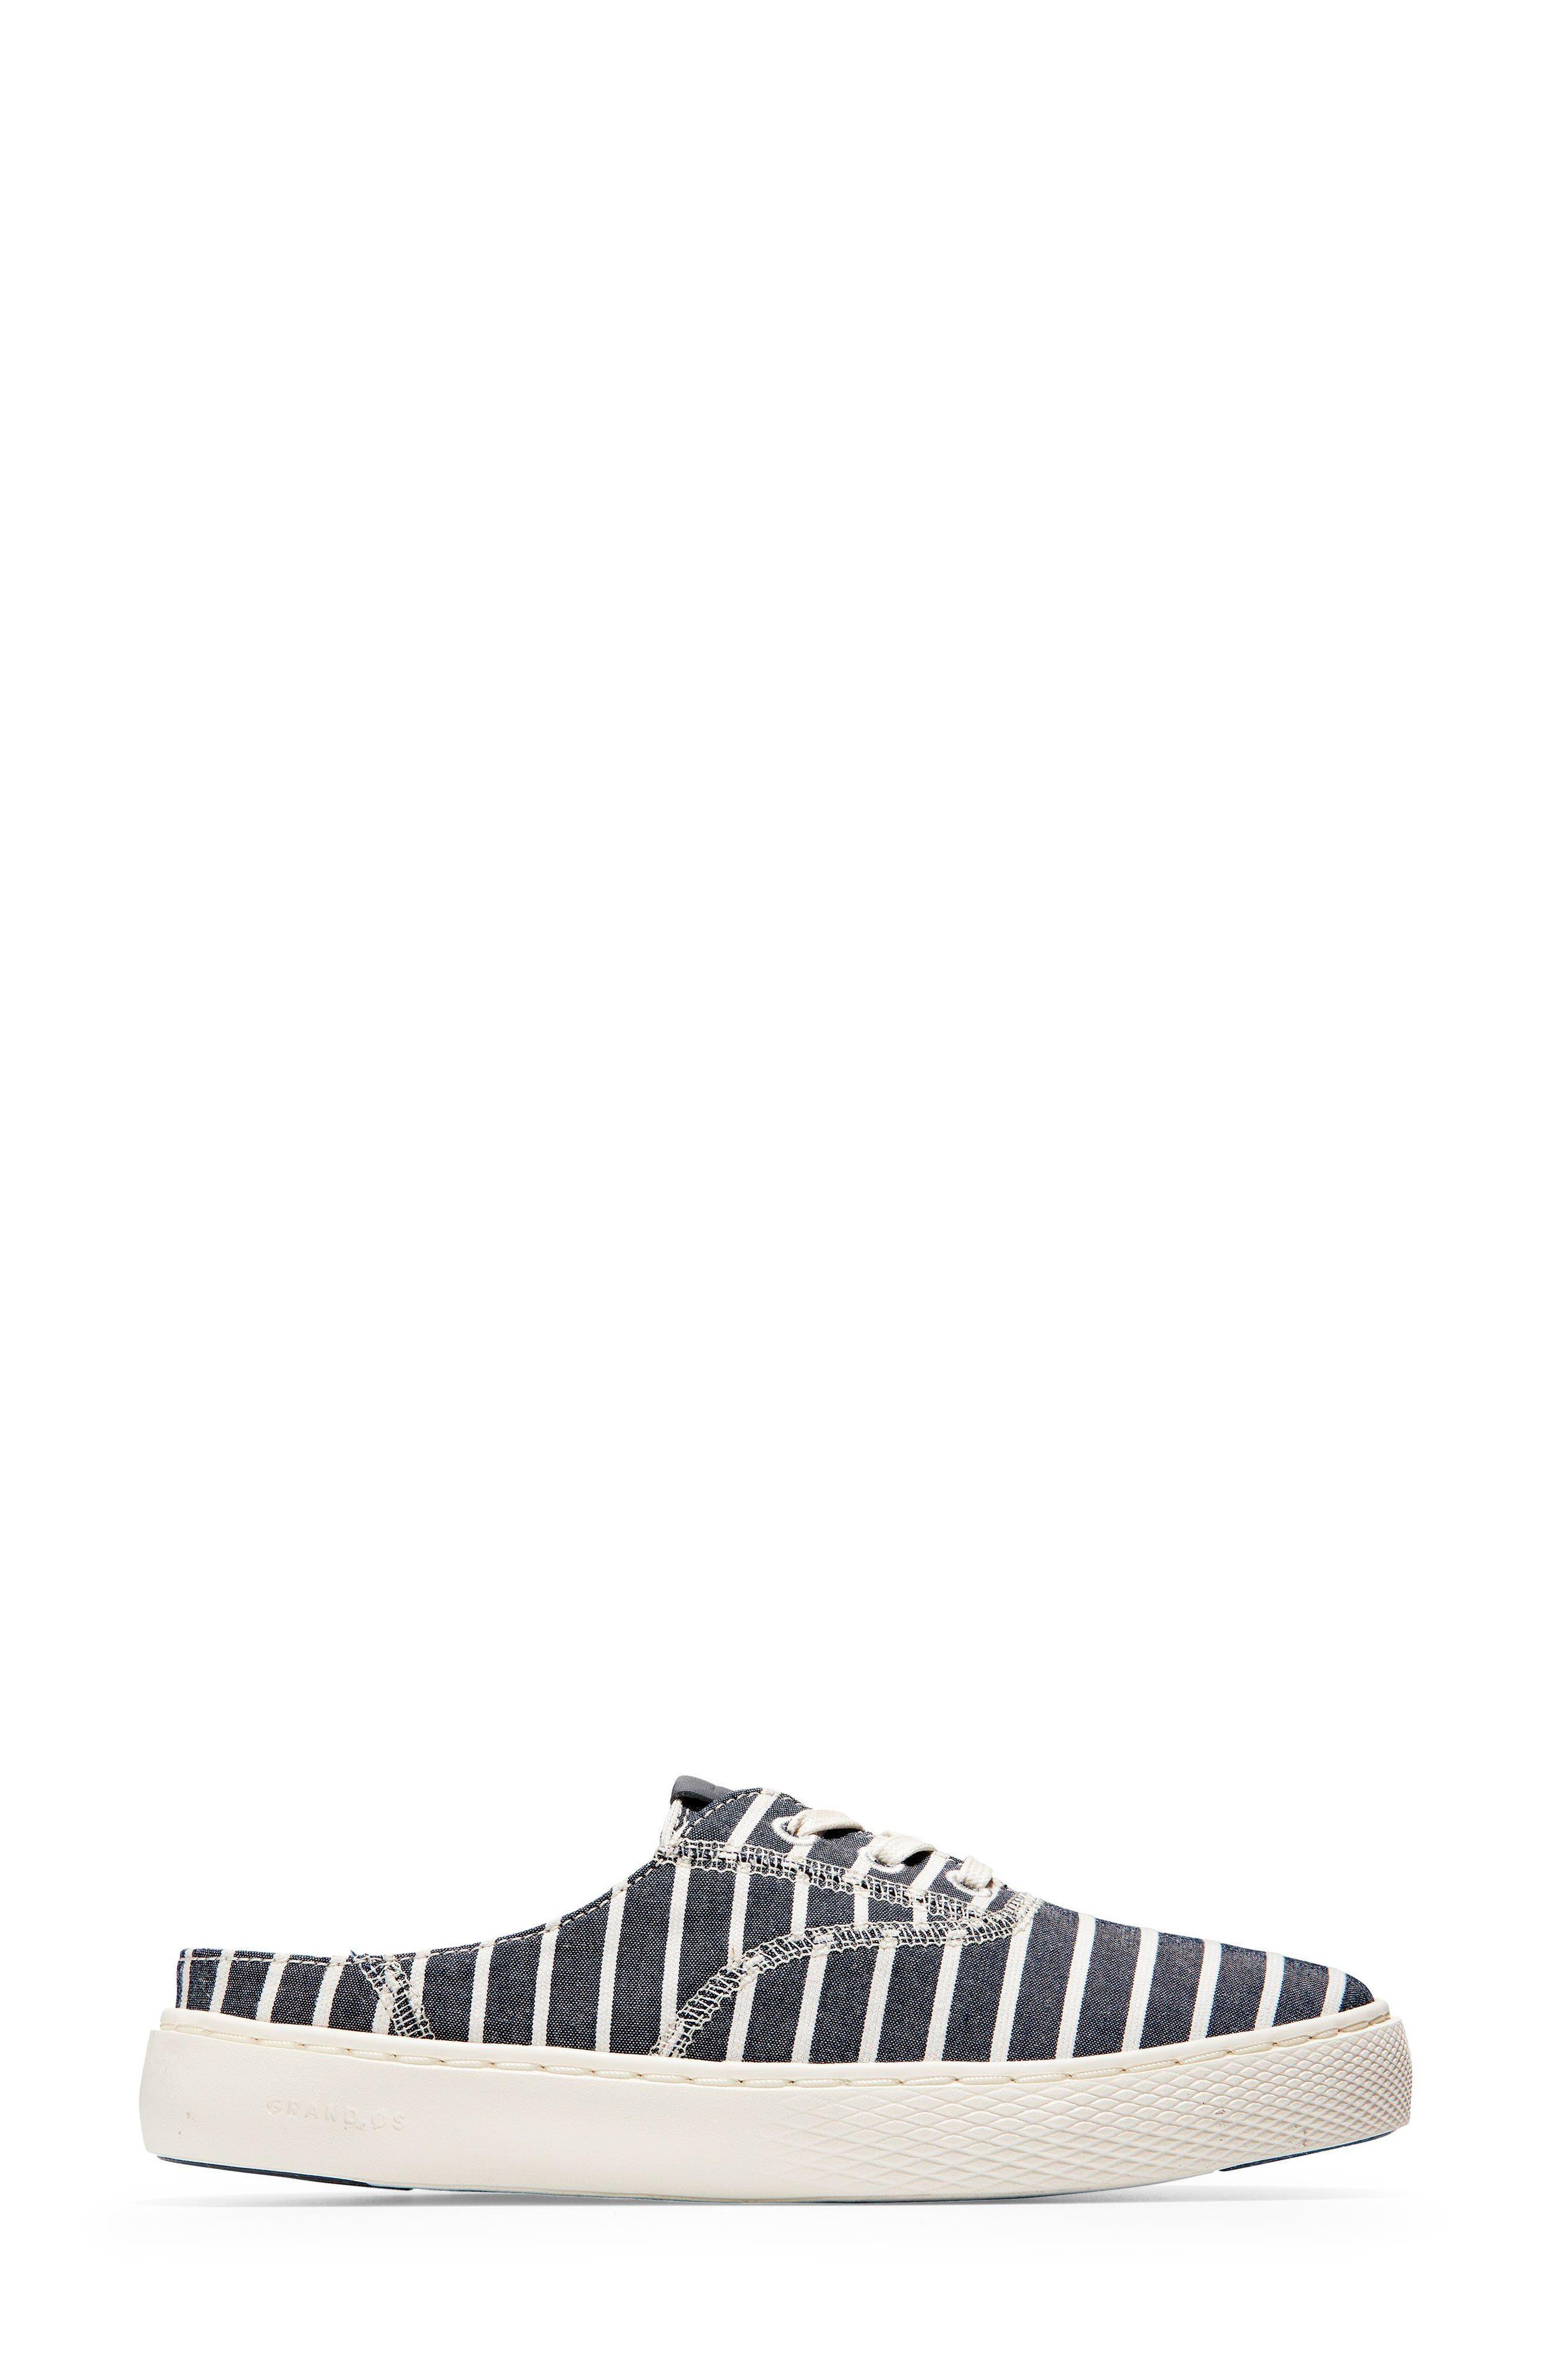 GrandPro Deck Sneaker,                             Alternate thumbnail 3, color,                             Freeport Stripe Fabric